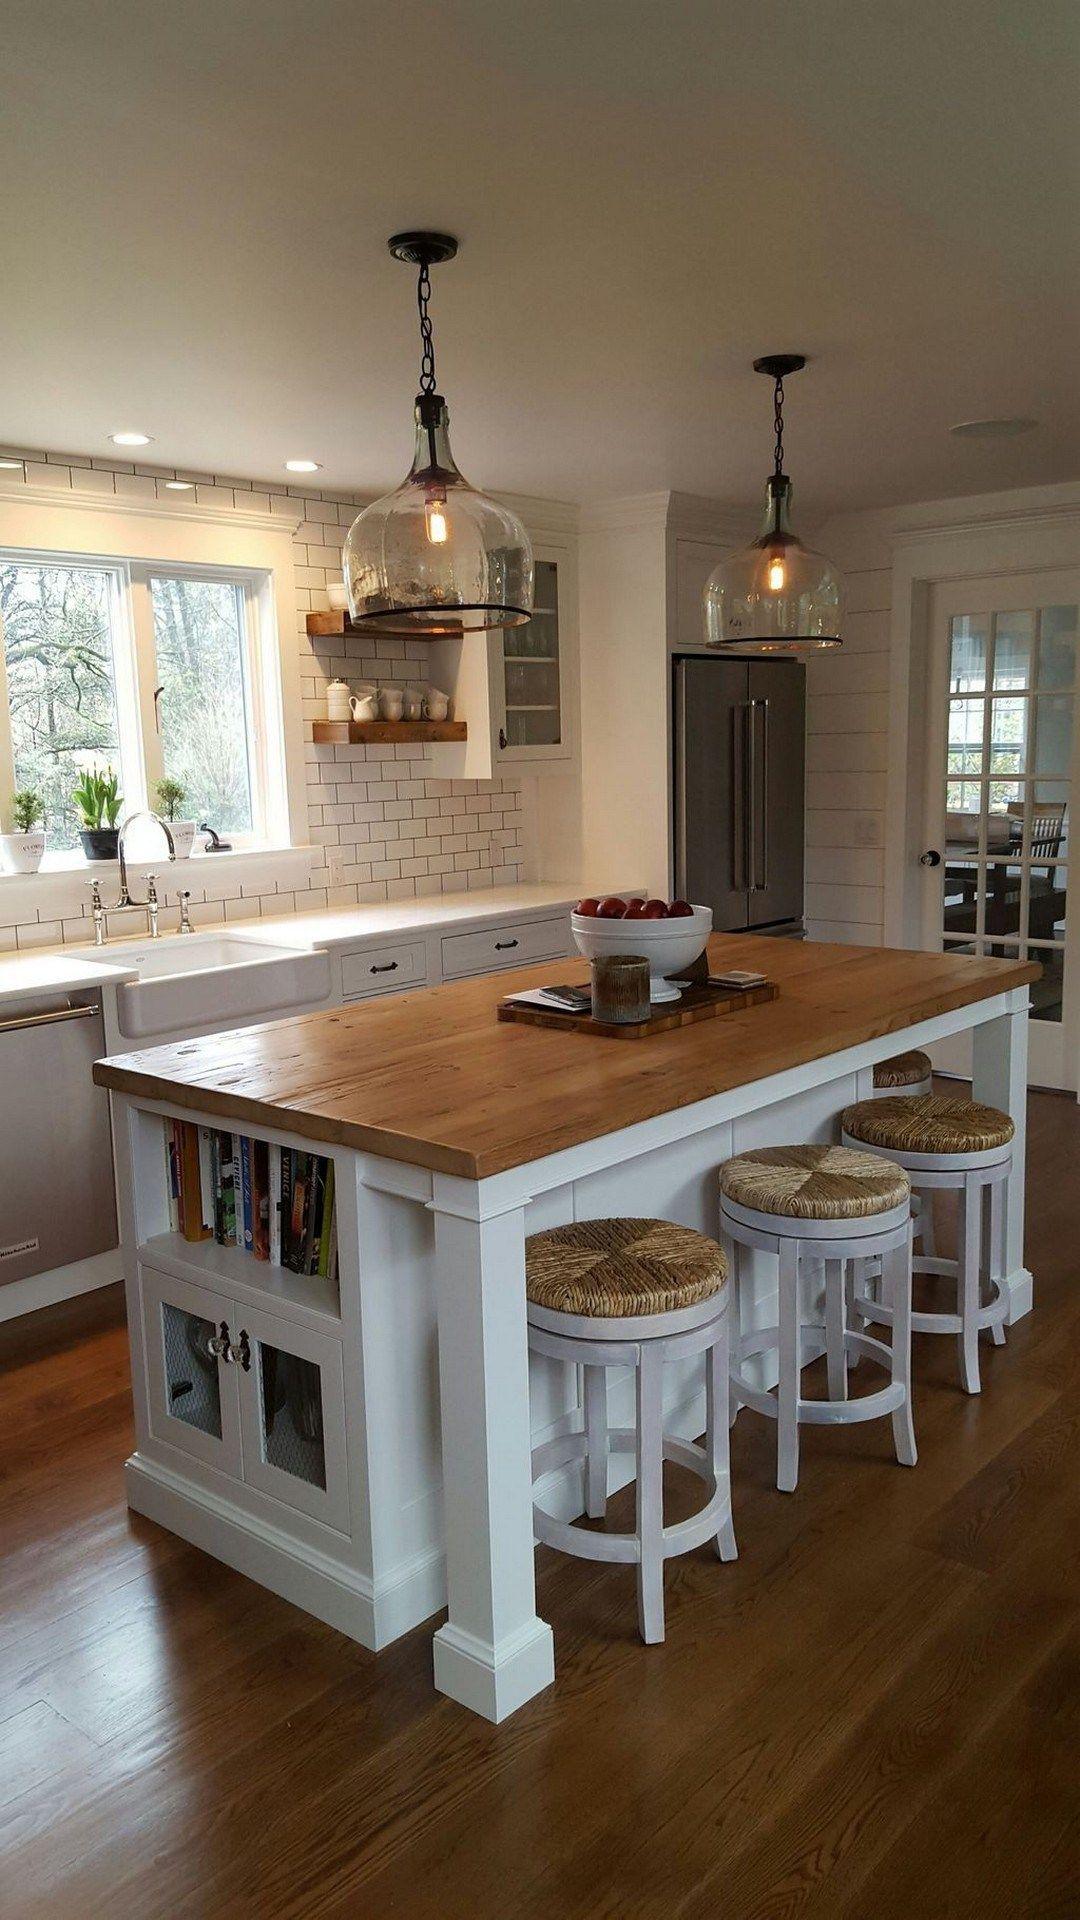 86 farmhouse kitchen island lighting 11 in 2020